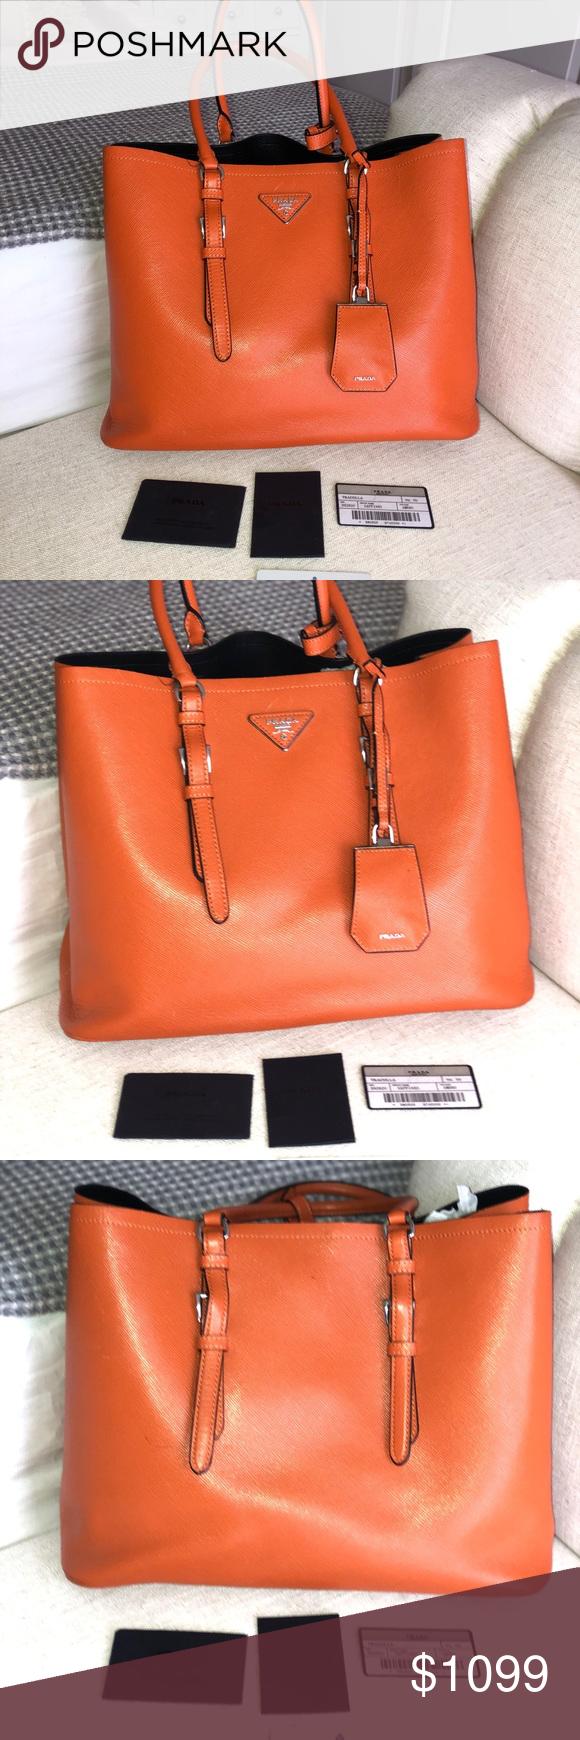 5fd48cdb37c7f4 PRADA Fuoco Saffiano Textured Leather Medium Beautiful hardly used bag(the  plastic protector on the